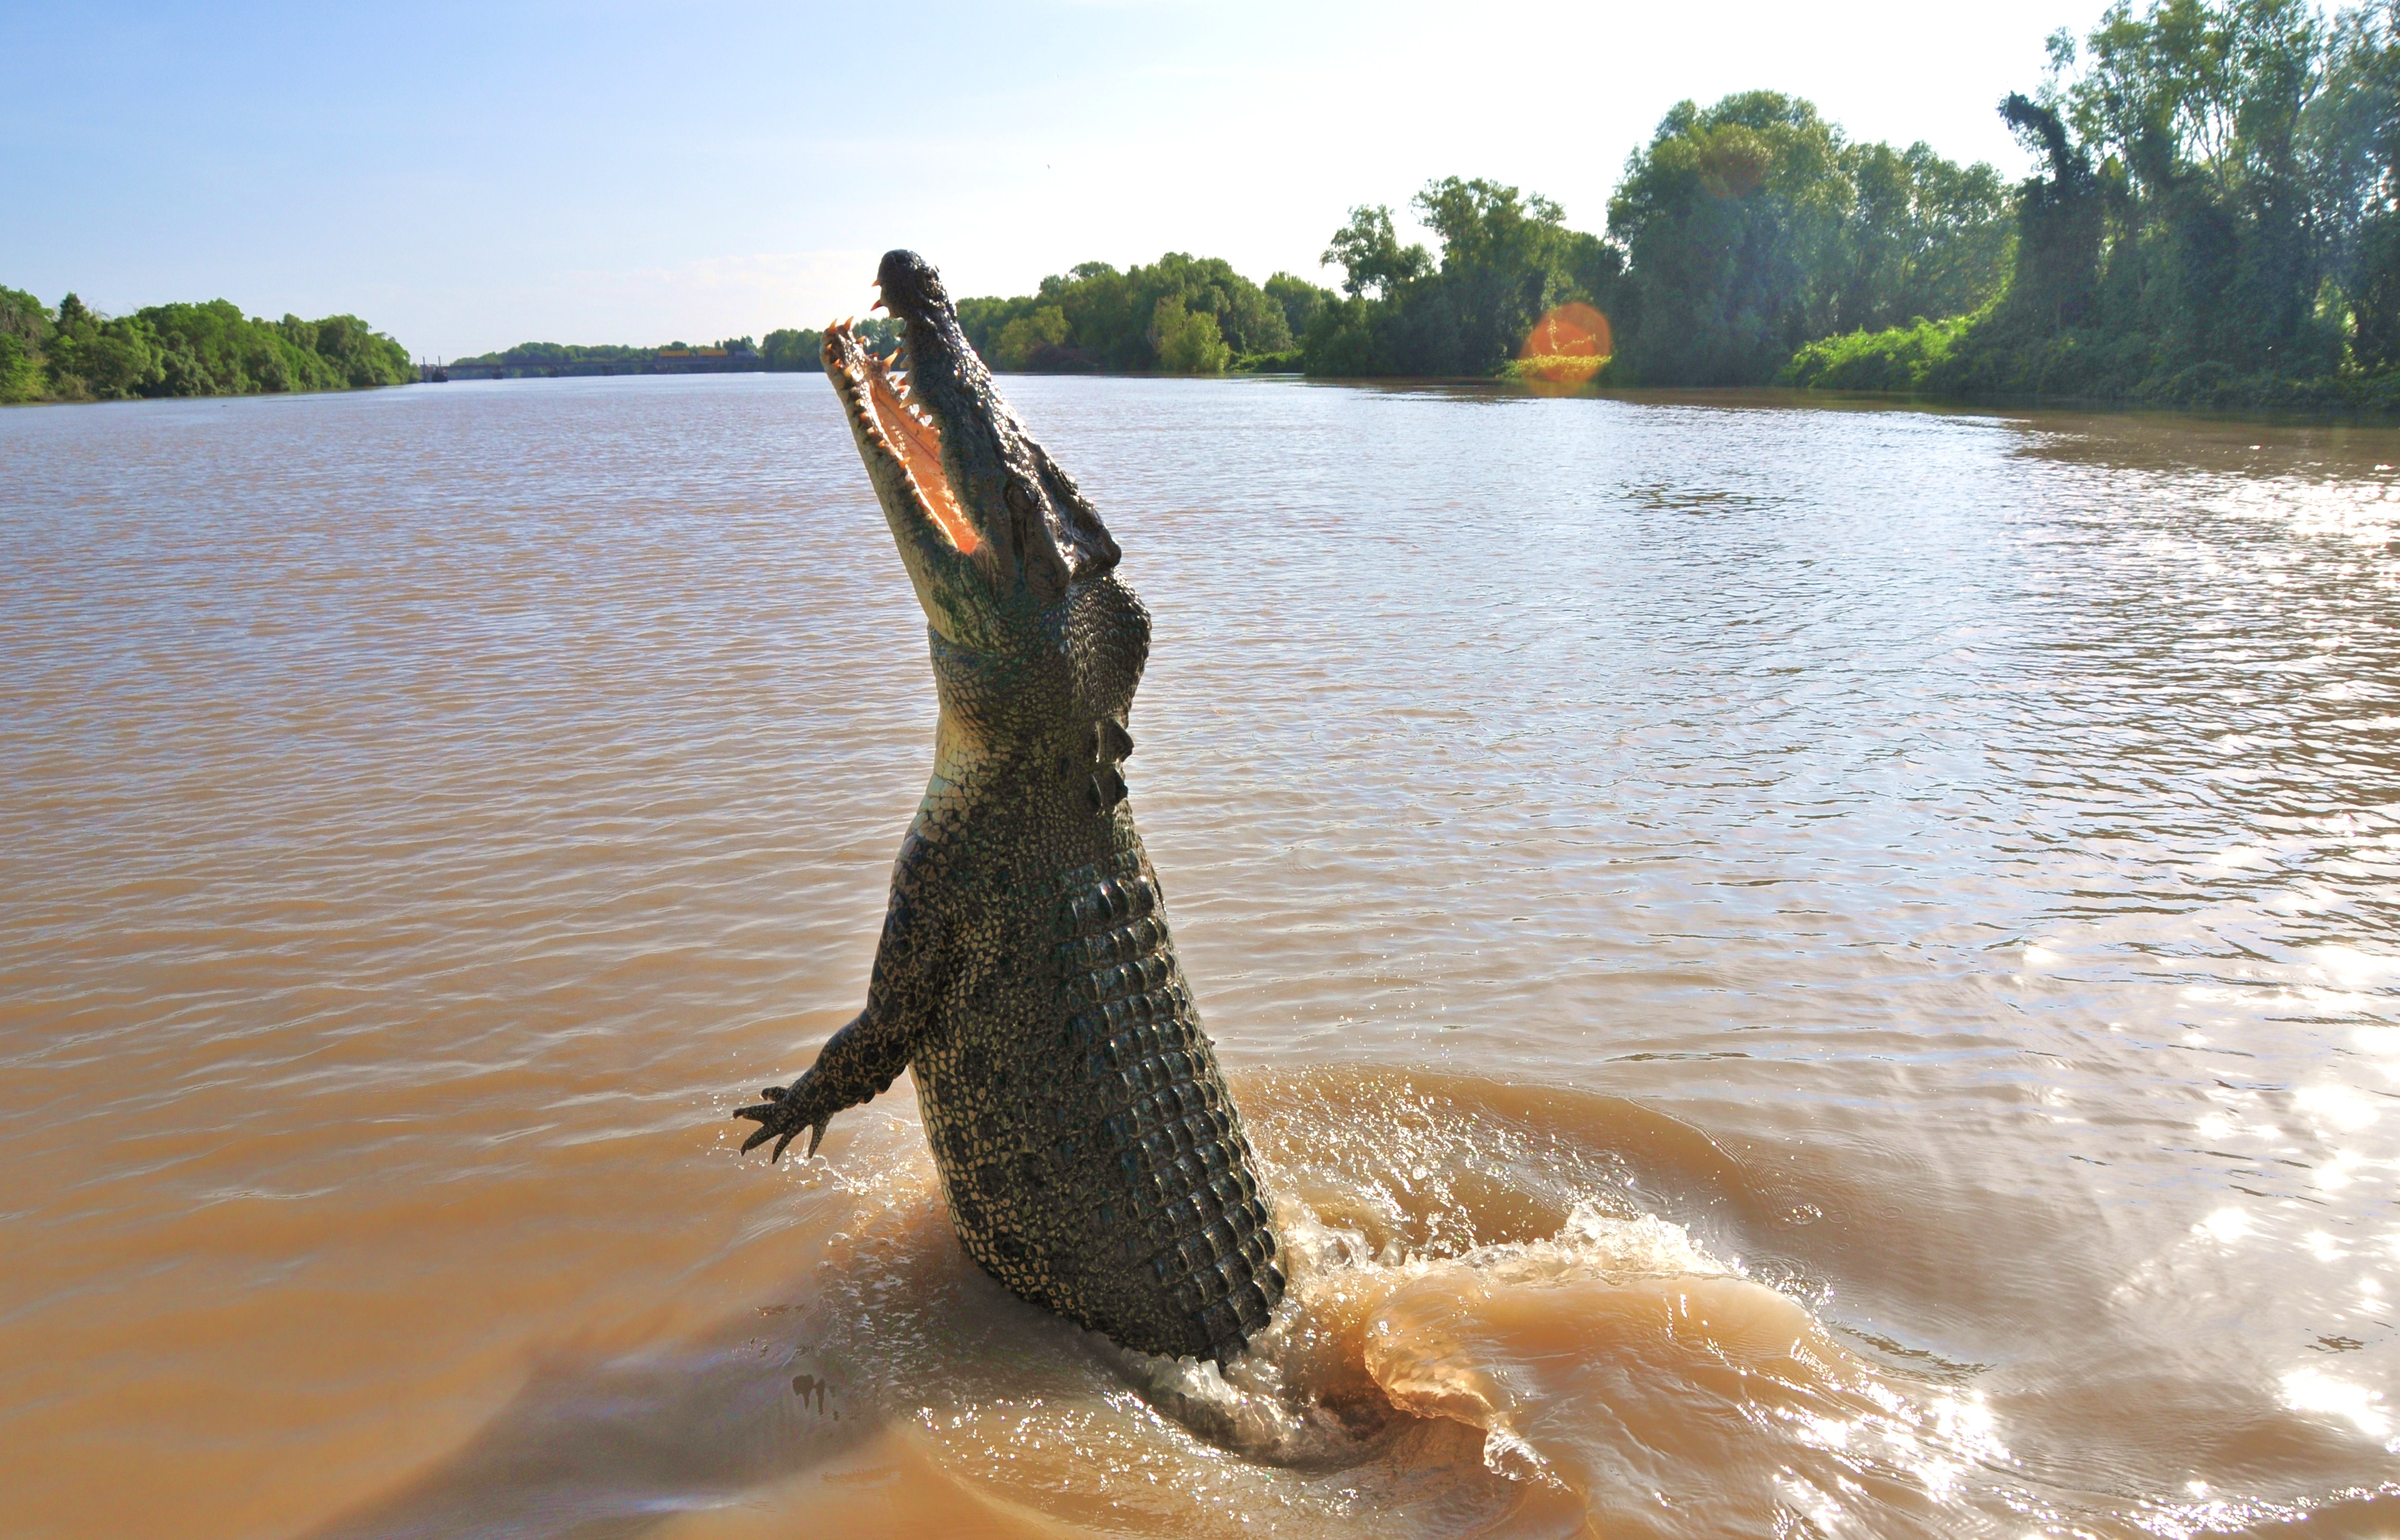 Jumping crocodiles